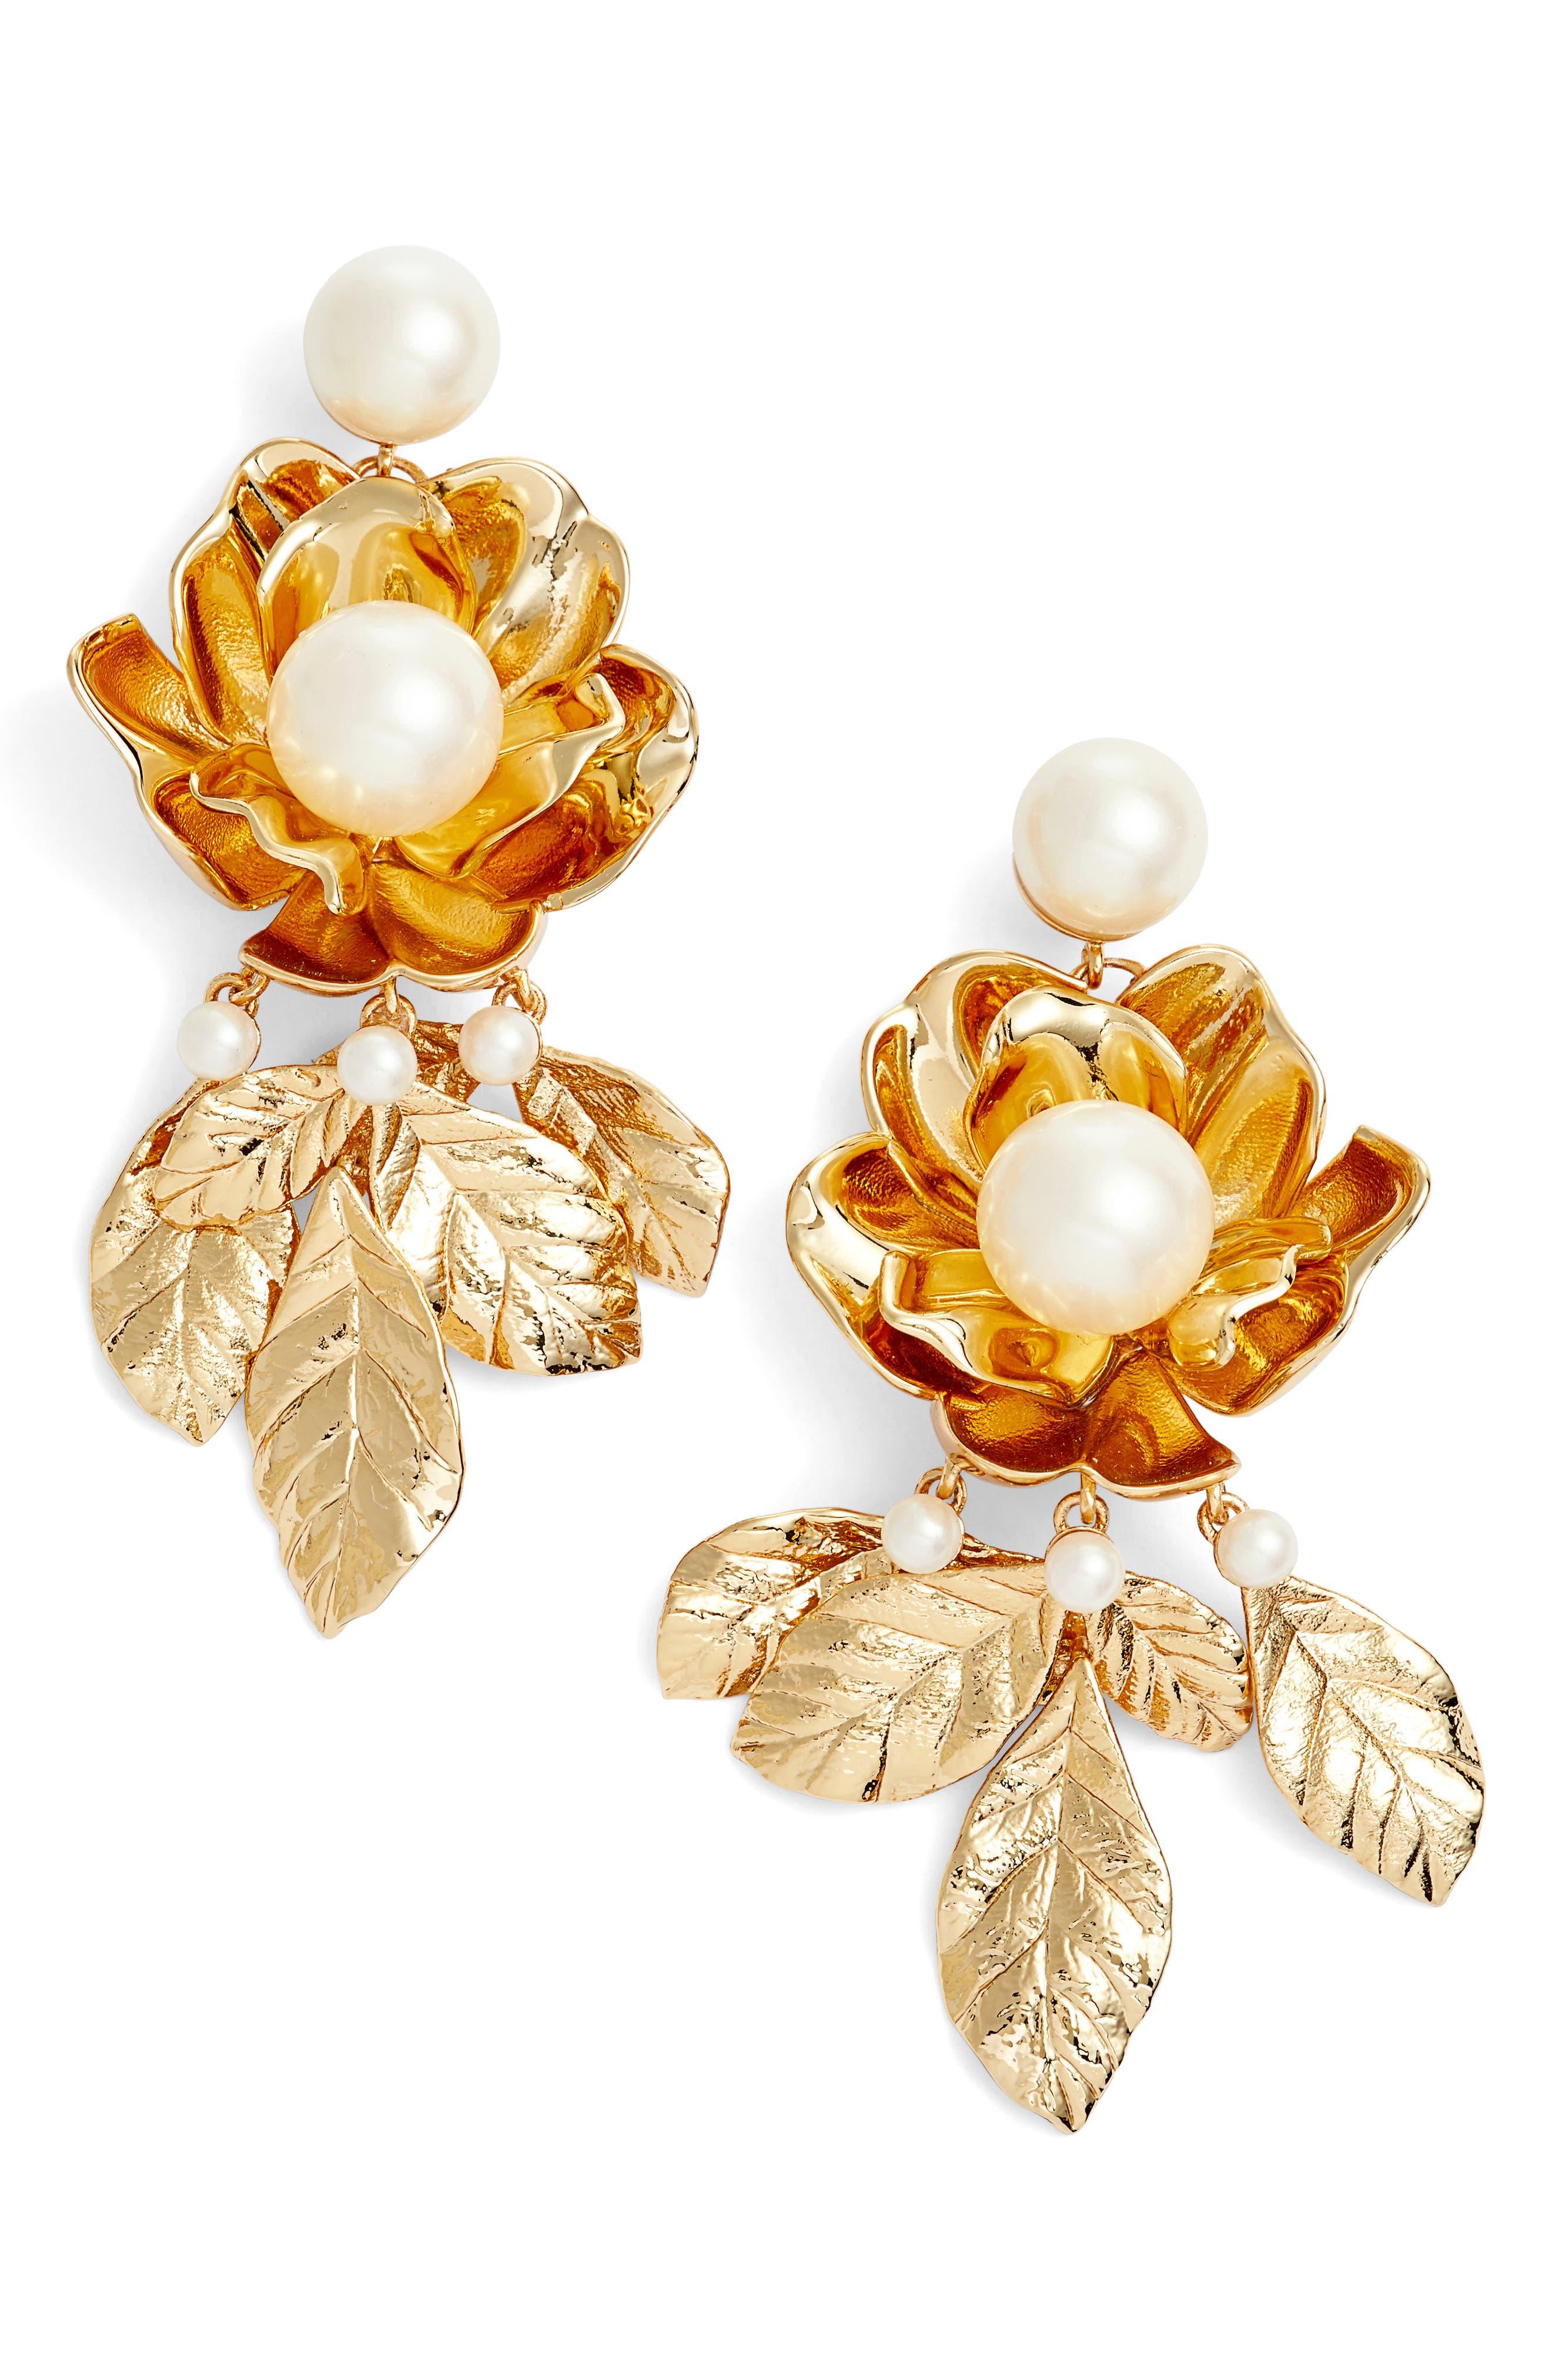 KATE SPADE NEW YORK,                             kate spade imitation pearl flower earrings,                             Main thumbnail 1, color,                             711